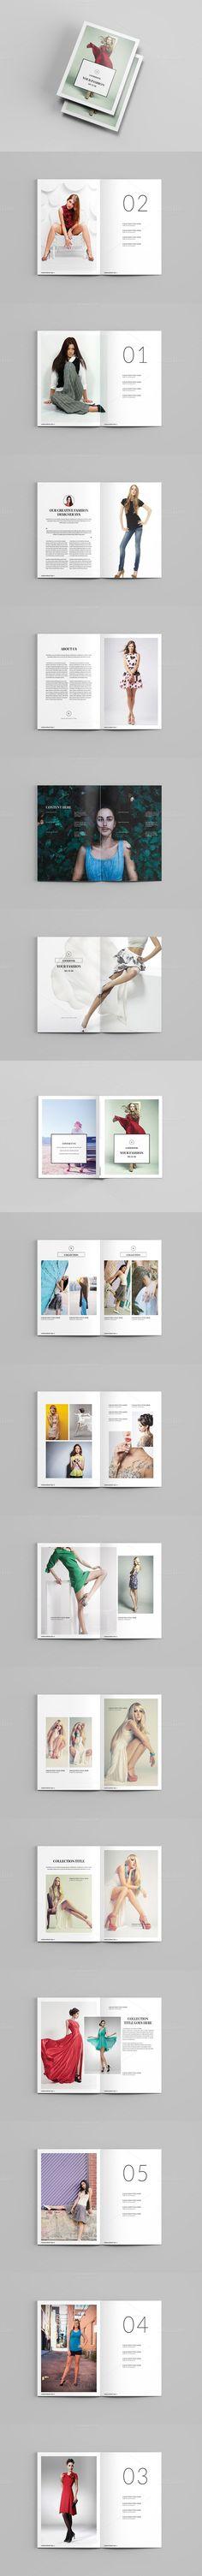 Modern Fashion Brochure Modern fashion, Brochures and Brochure - fashion design brochure template